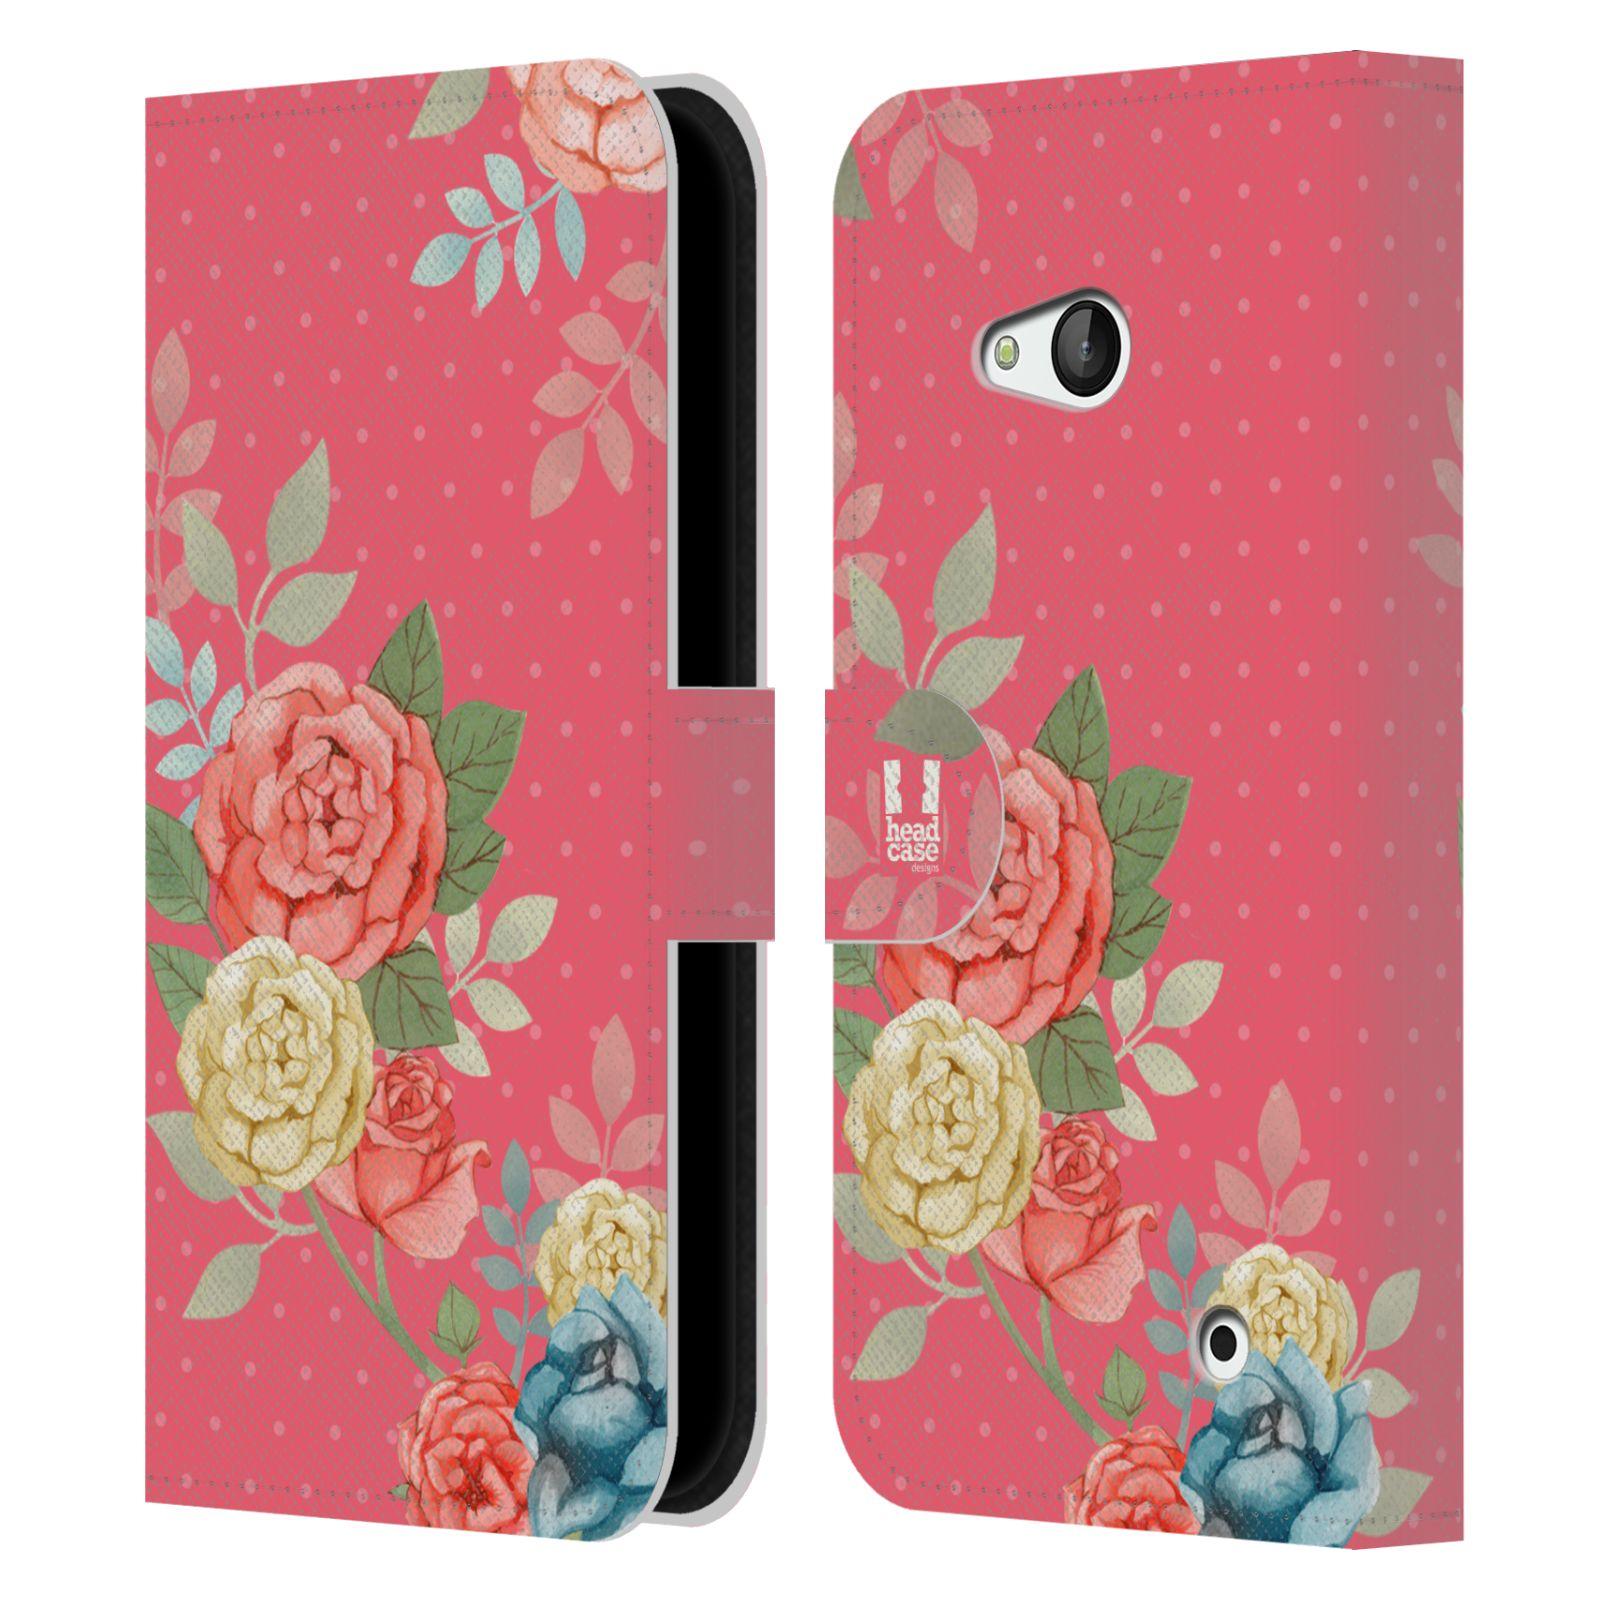 HEAD CASE Flipové pouzdro pro mobil NOKIA / MICROSOFT LUMIA 640 / LUMIA 640 DUAL romantické květy růžová